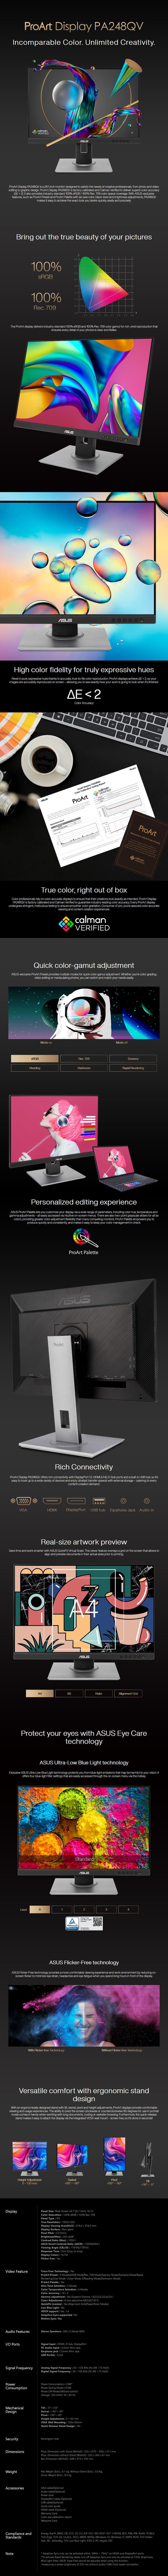 "ASUS ProArt PA248QV 24.1"" WUXGA 100% sRGB Professional IPS Monitor - Overview 1"